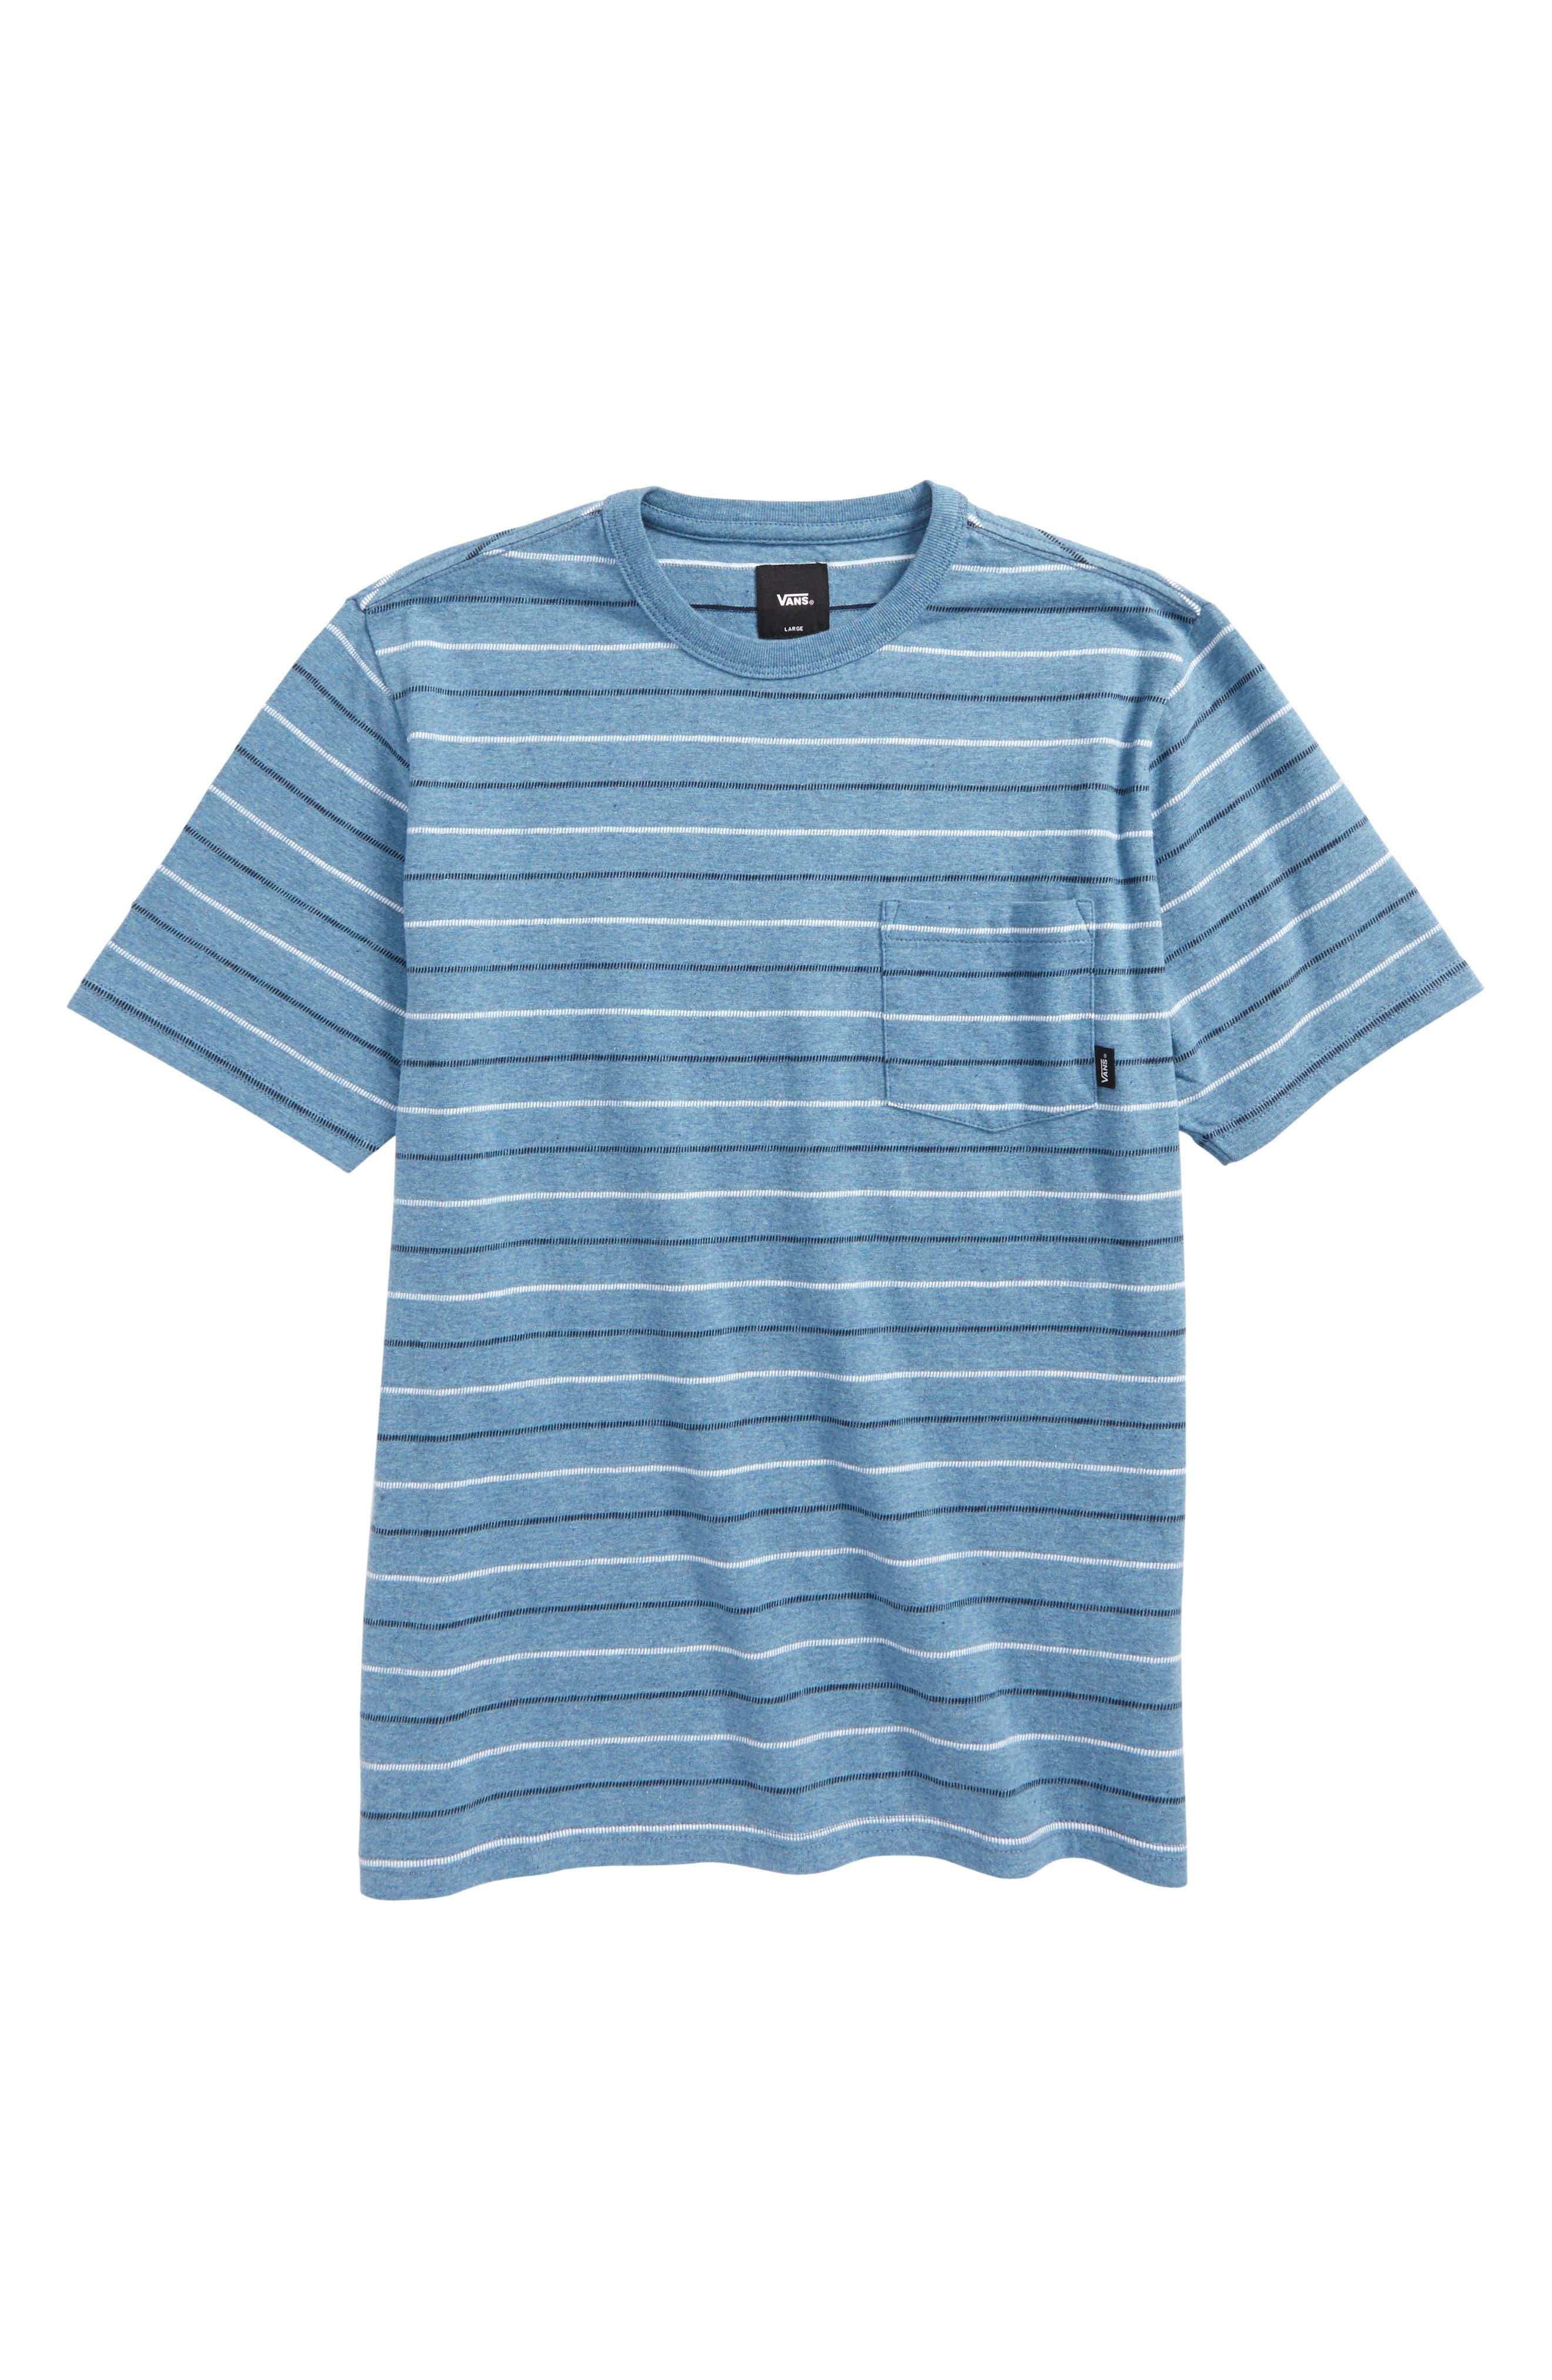 Vans Strikemont III T-Shirt (Big Boys)